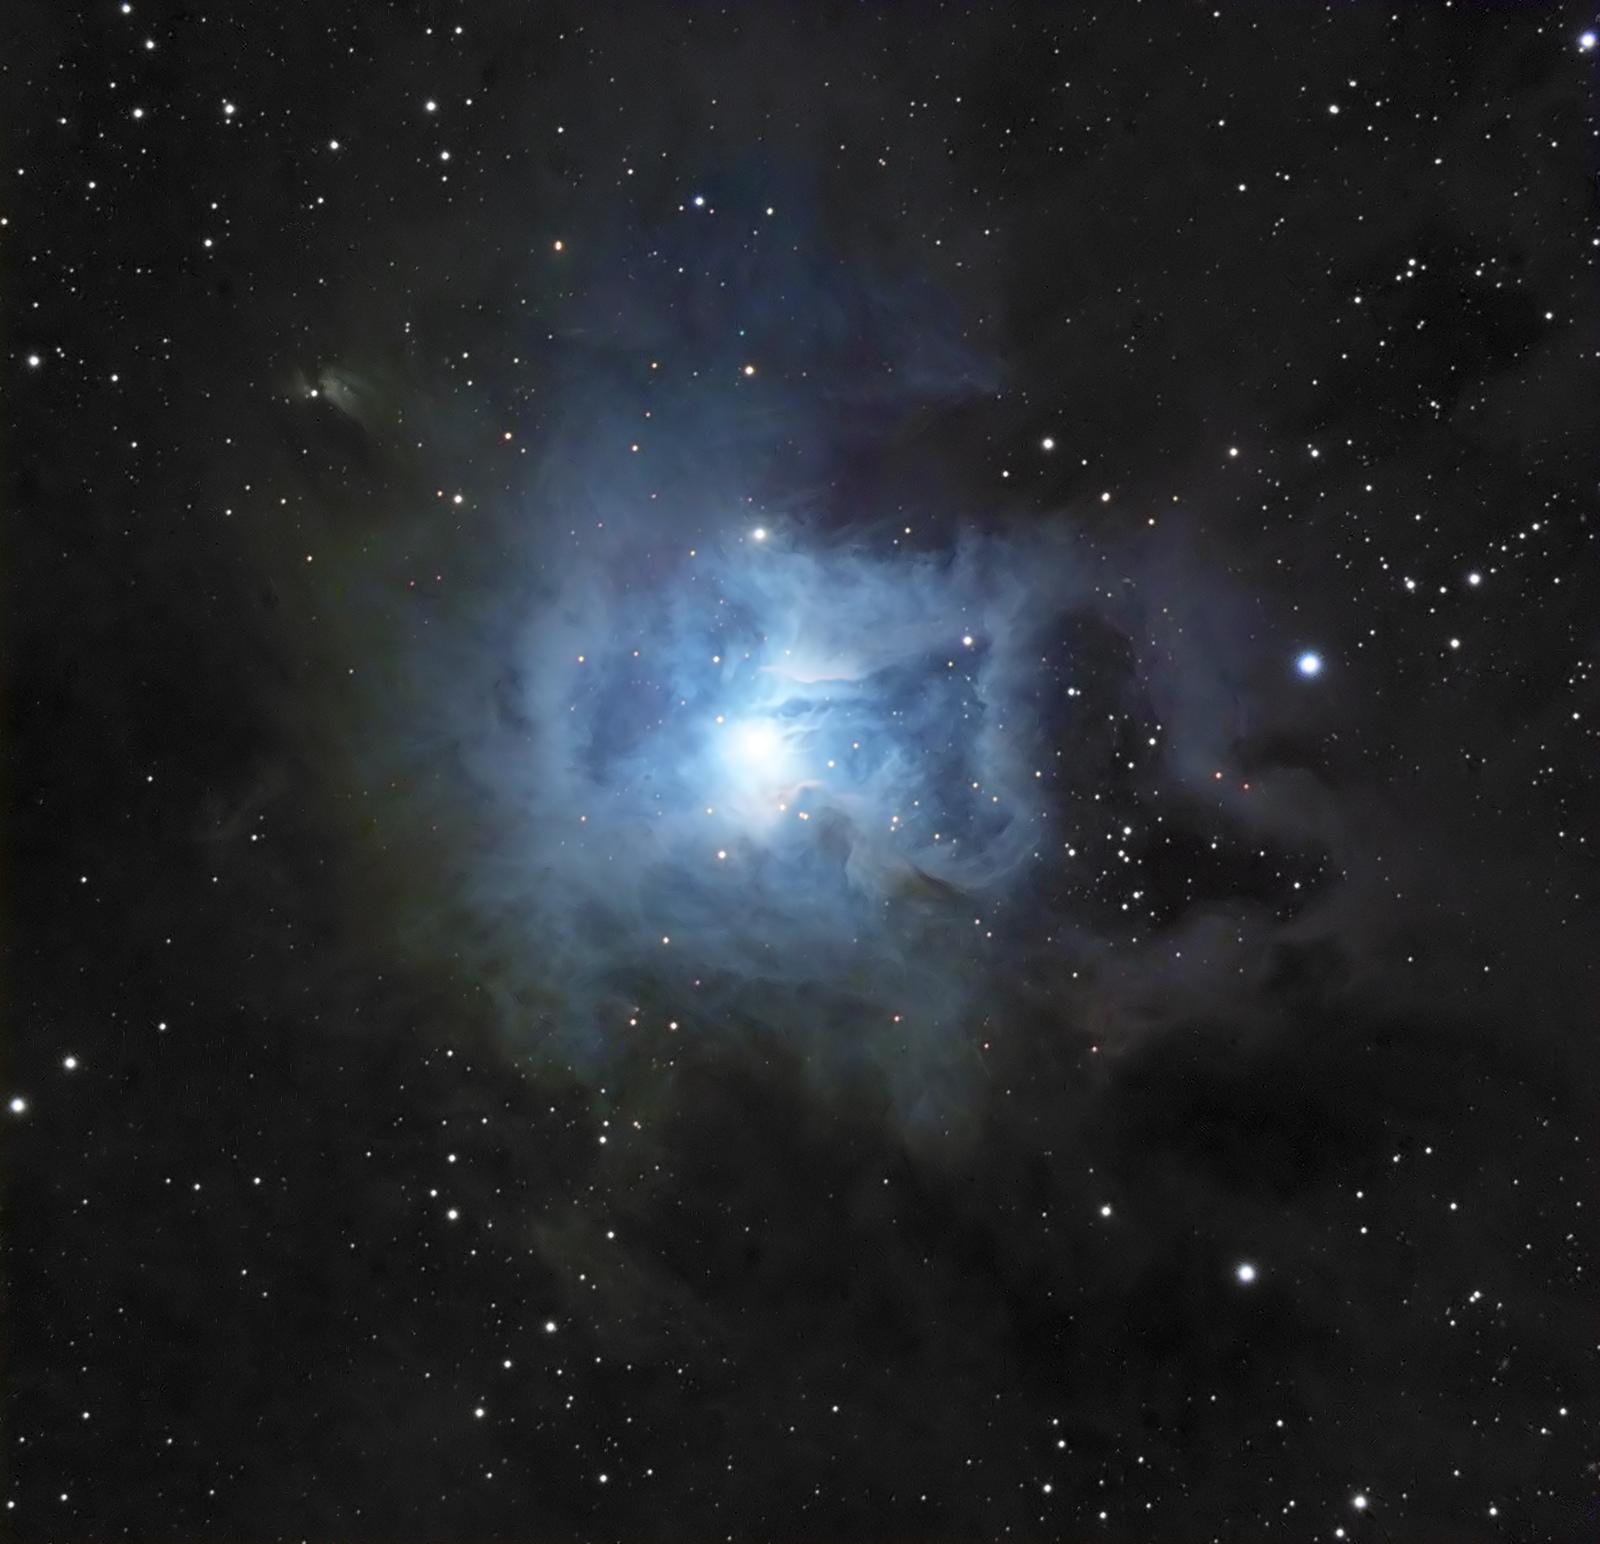 5d6fe8c0c5824_NGC7023_CRGB_TF_1600.jpg.9c02177a62dcab60aedc76e165636b12.jpg